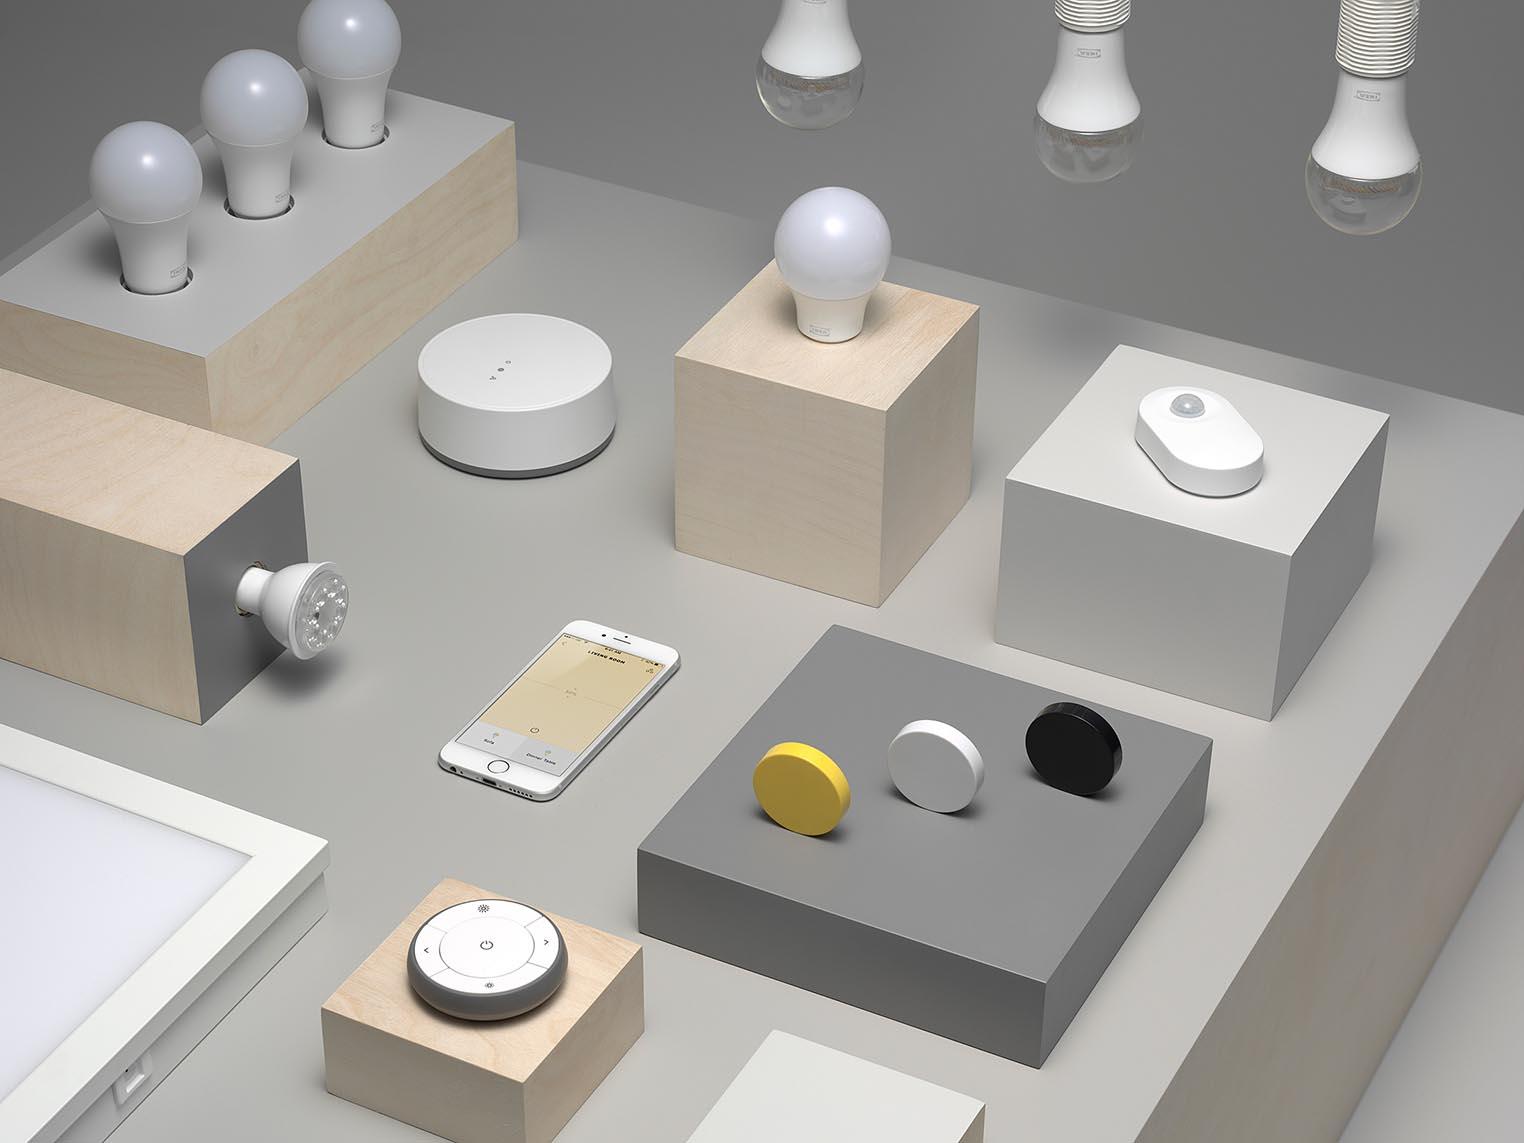 Ampoules Ikea TRADFRI